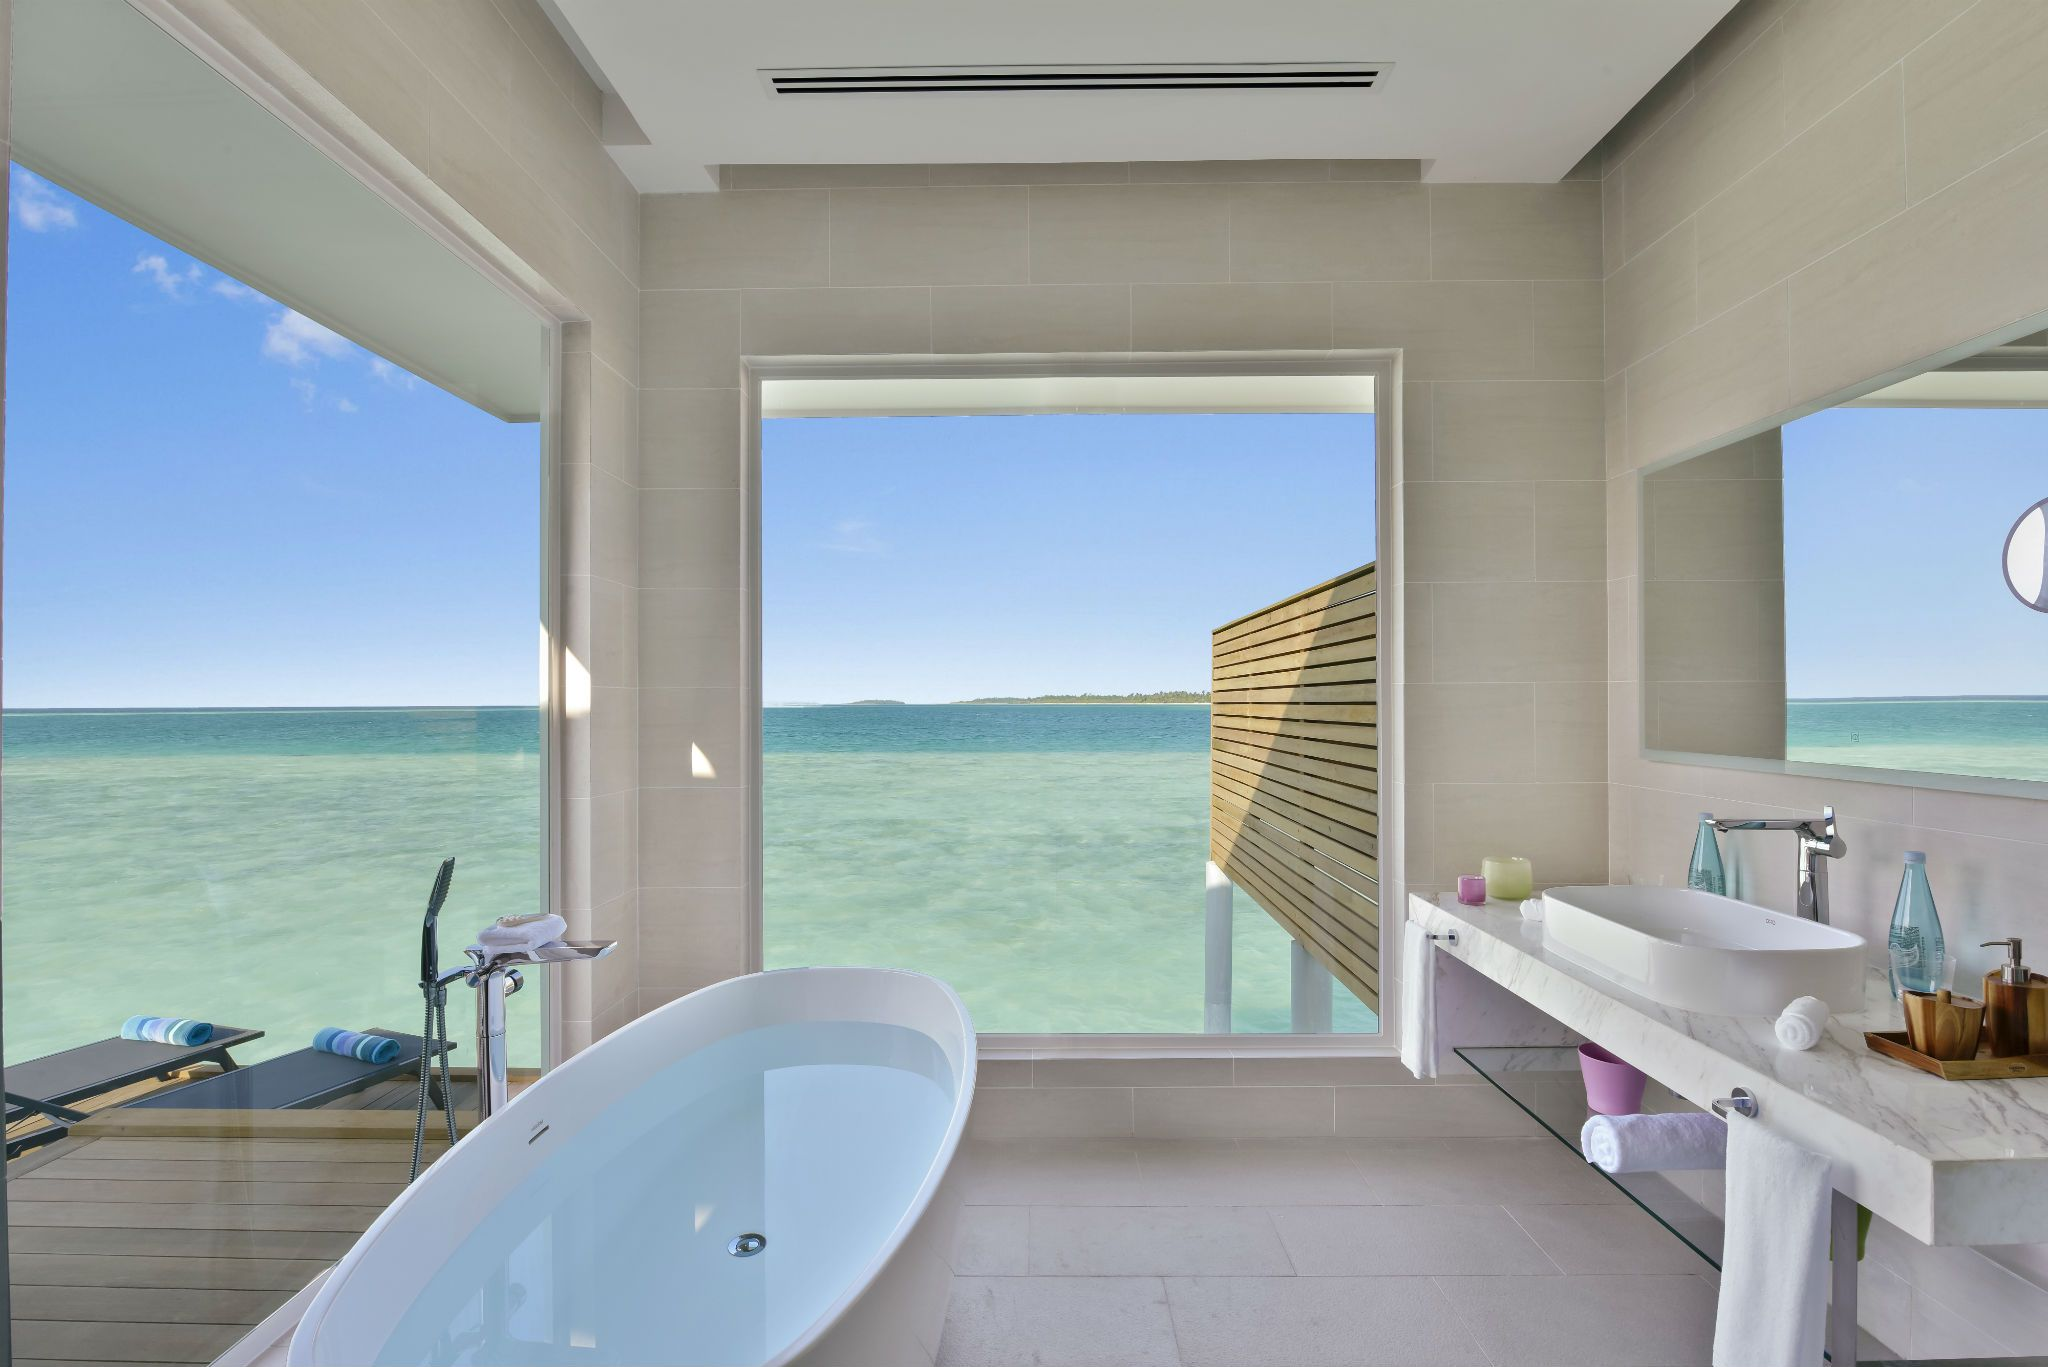 Bathtub views - 18 luxury bathrooms with incredible views